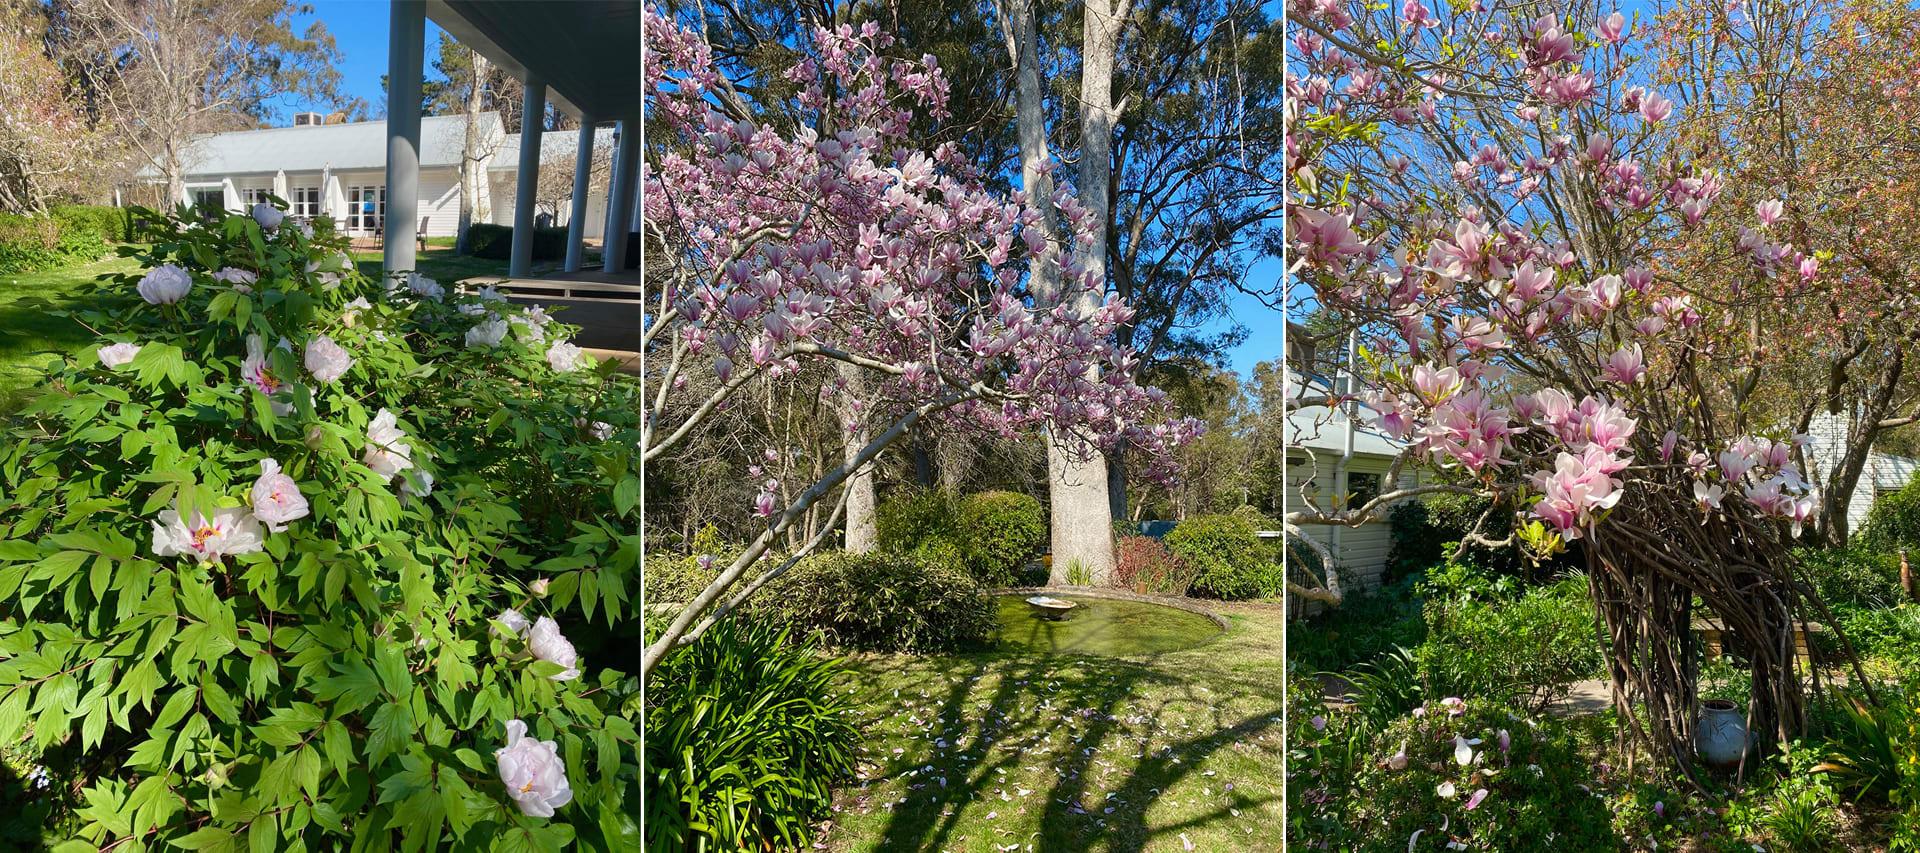 Tree peonies and magnolias in Sturt garden